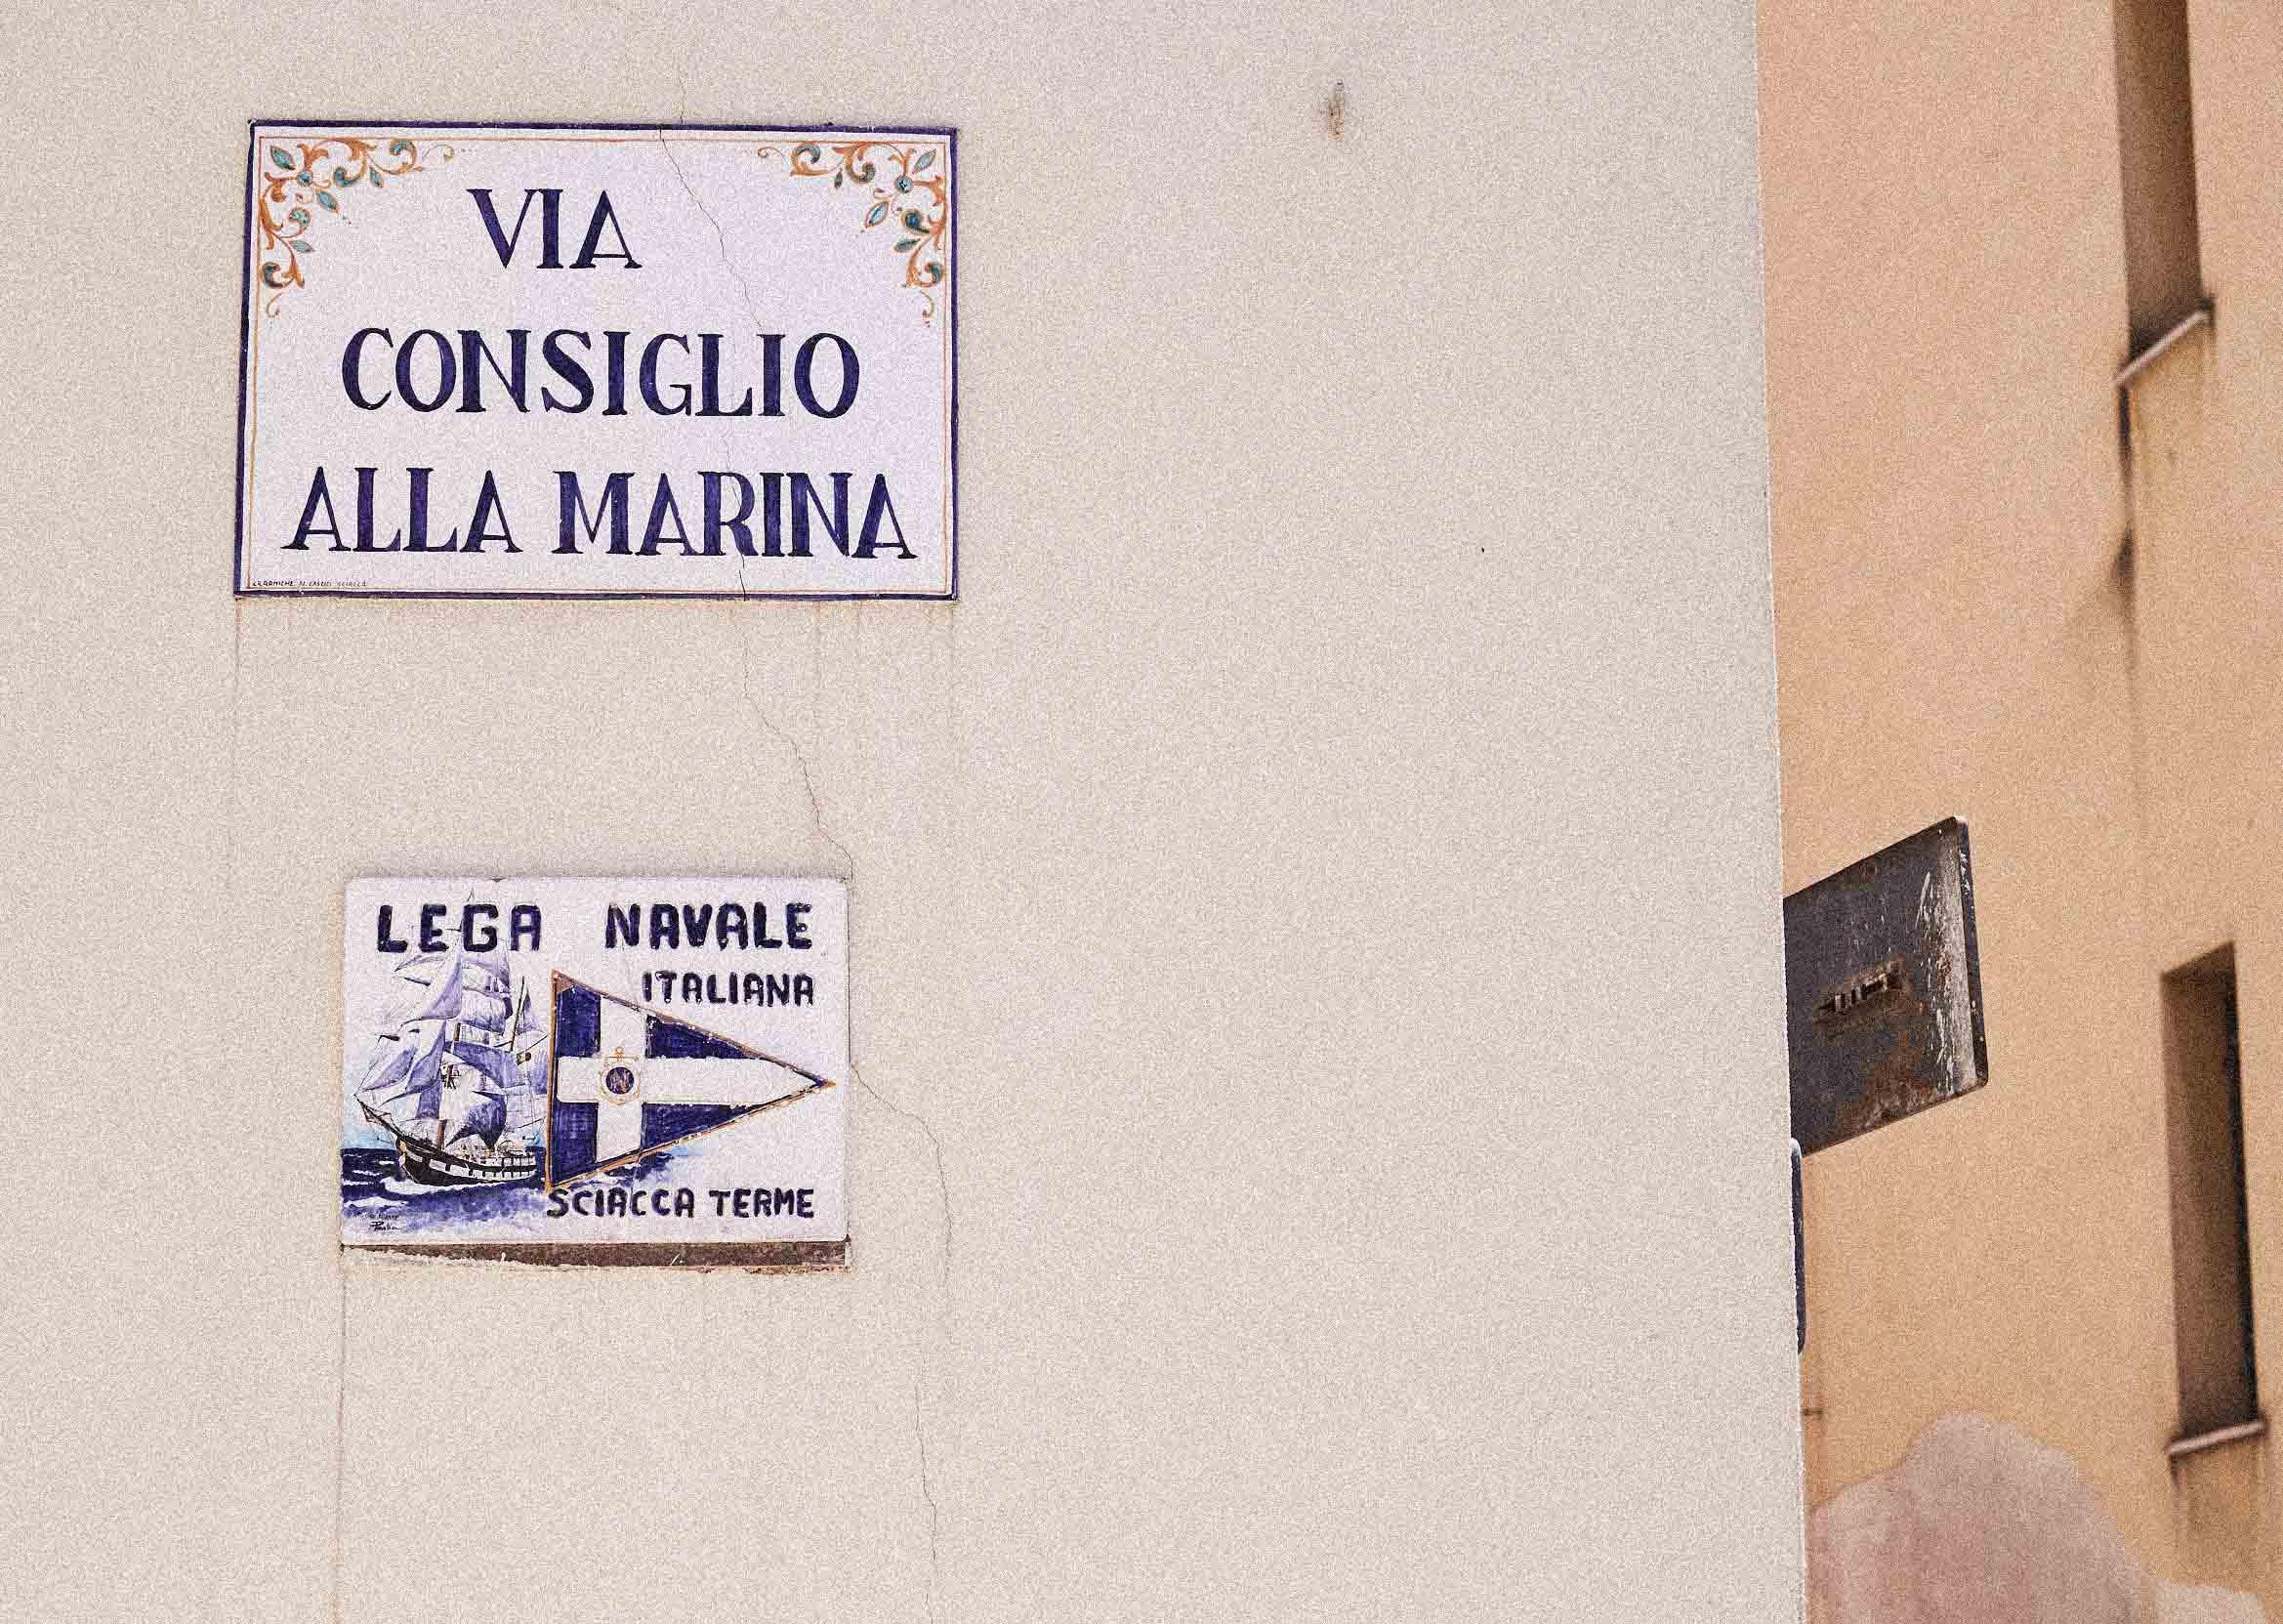 Sicily_0619_0P4A7679_X_X